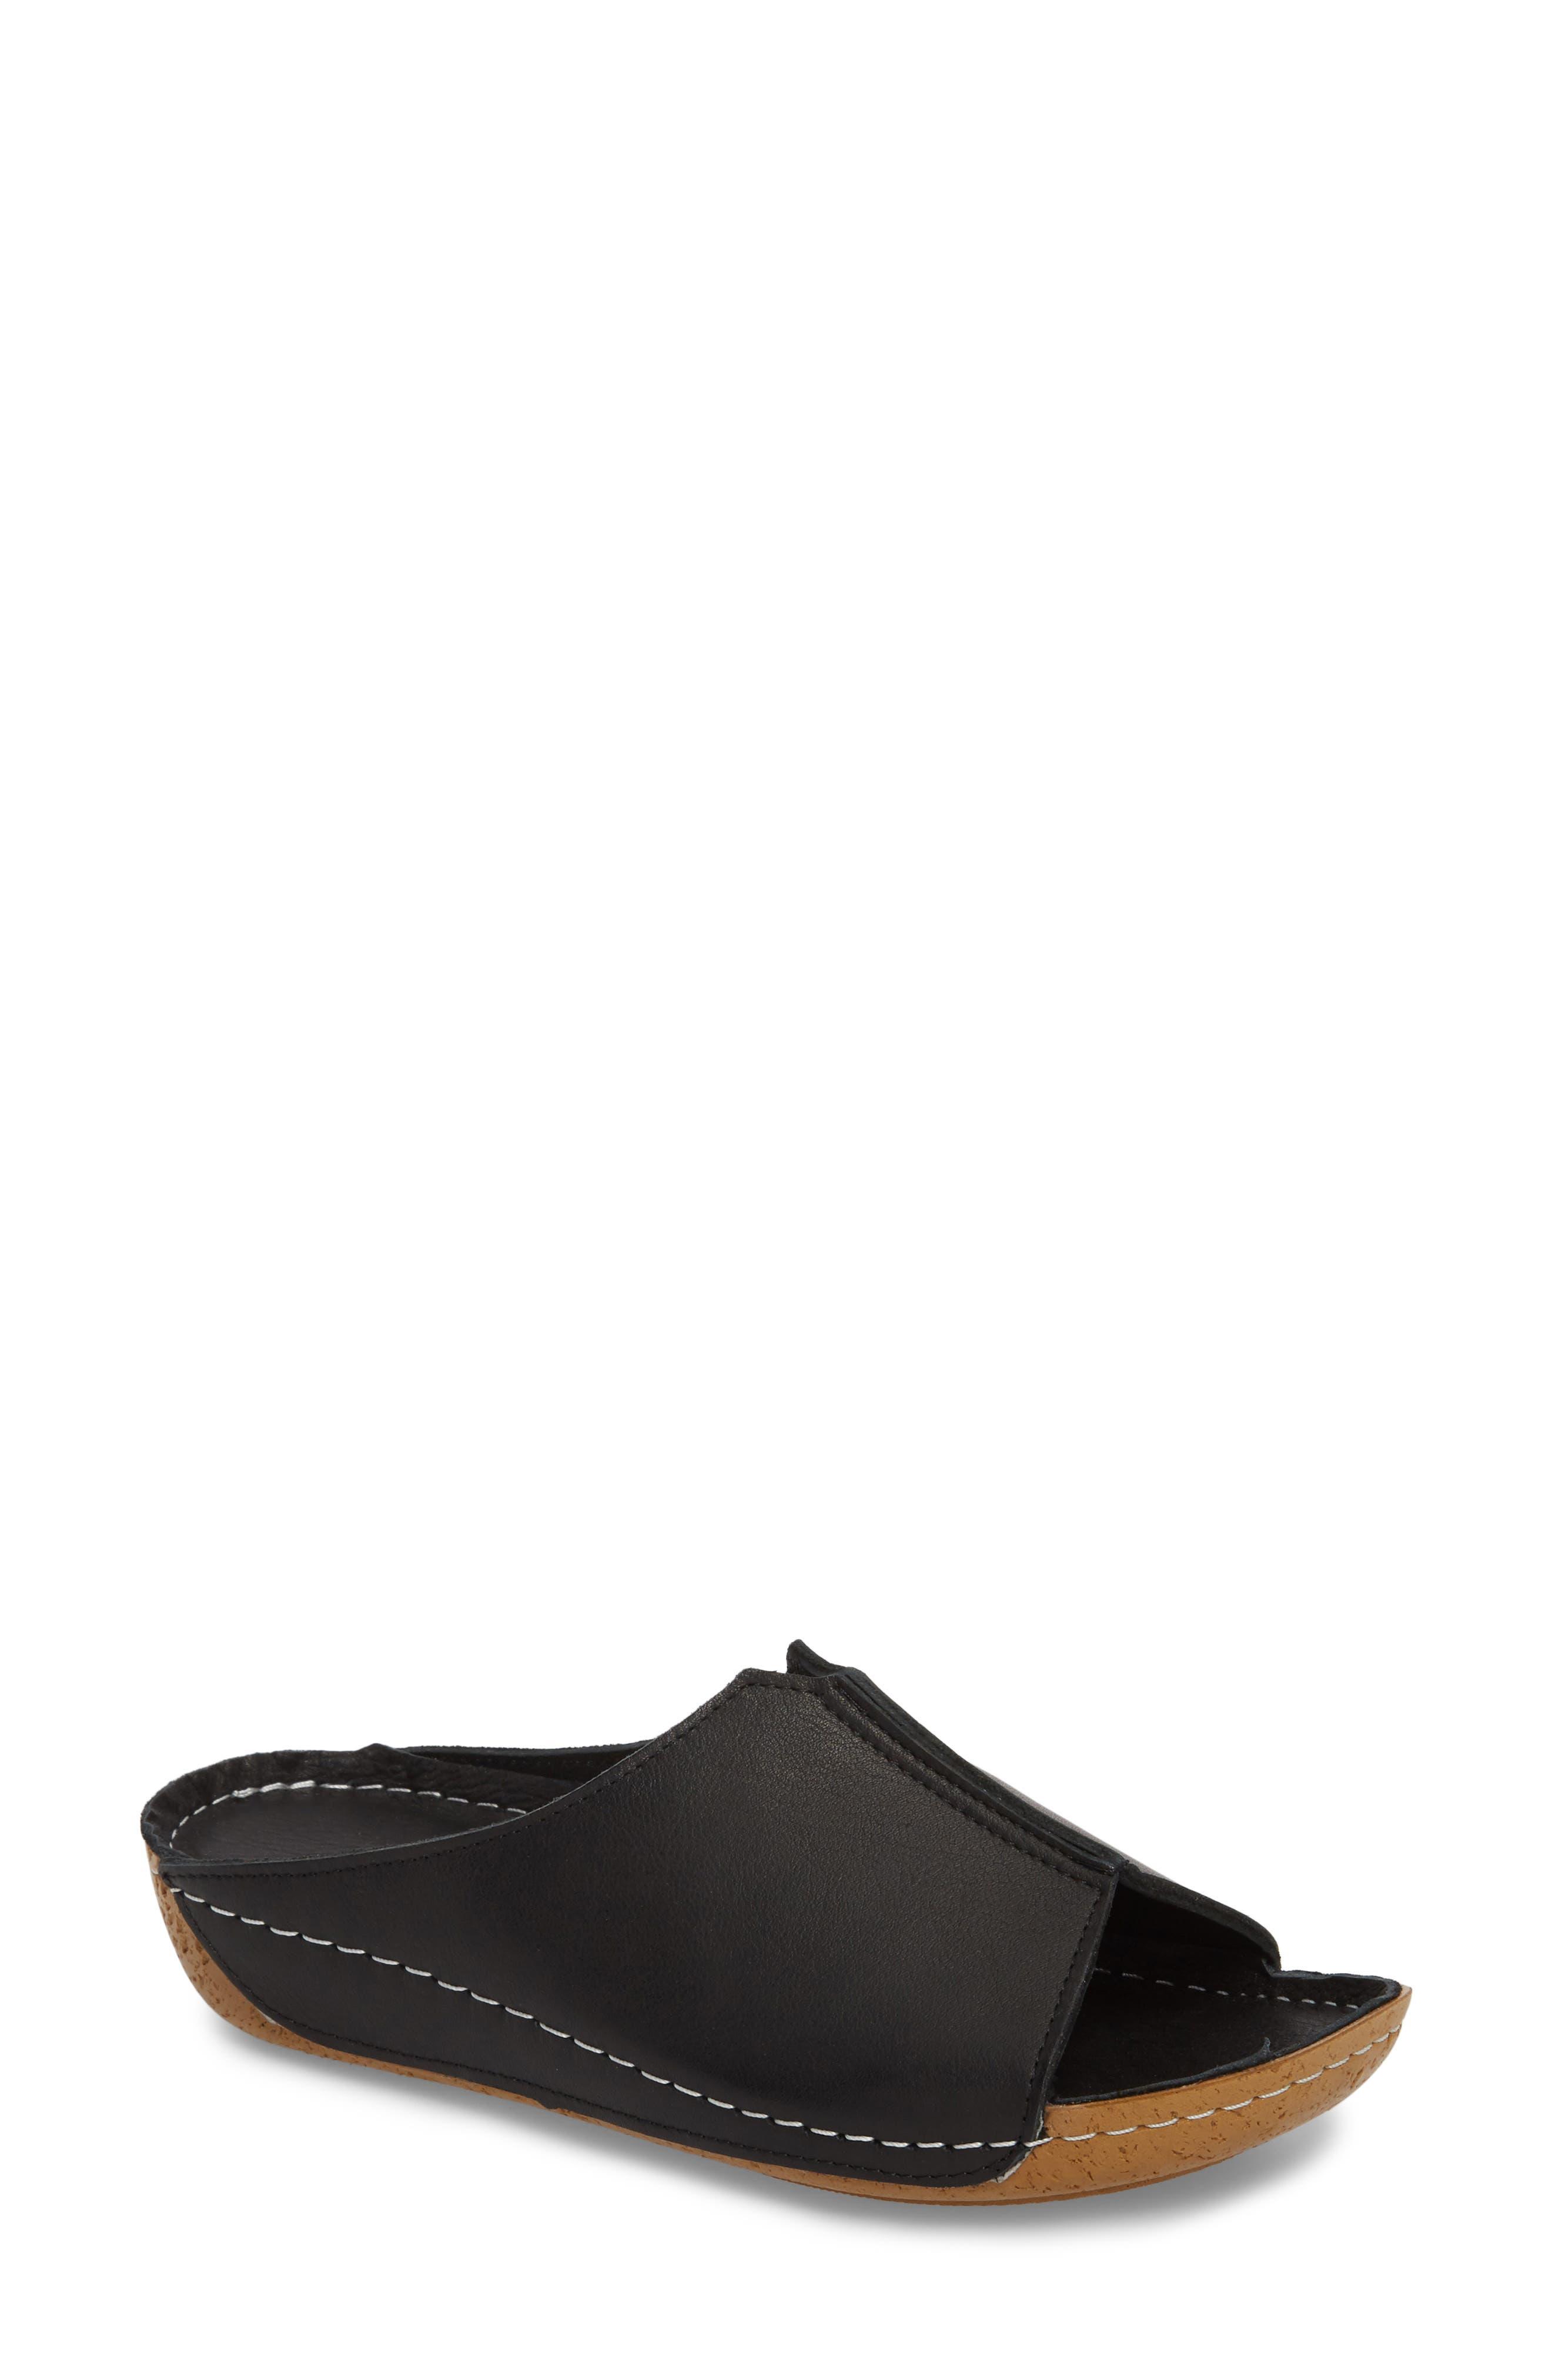 Alexa 3 Slide Sandal,                         Main,                         color,